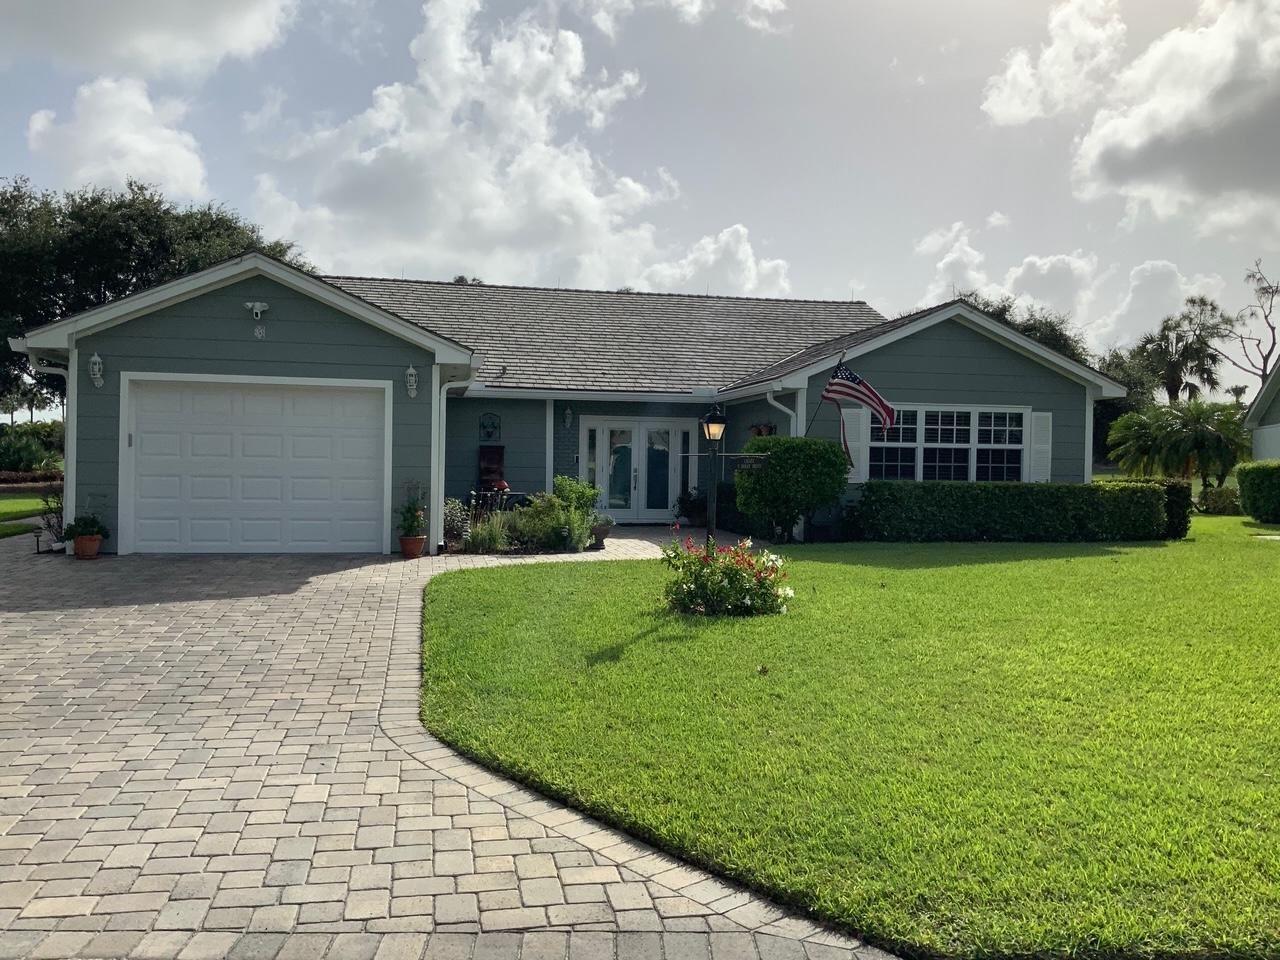 5 Holly Drive, Boynton Beach, FL 33436 - #: RX-10660233